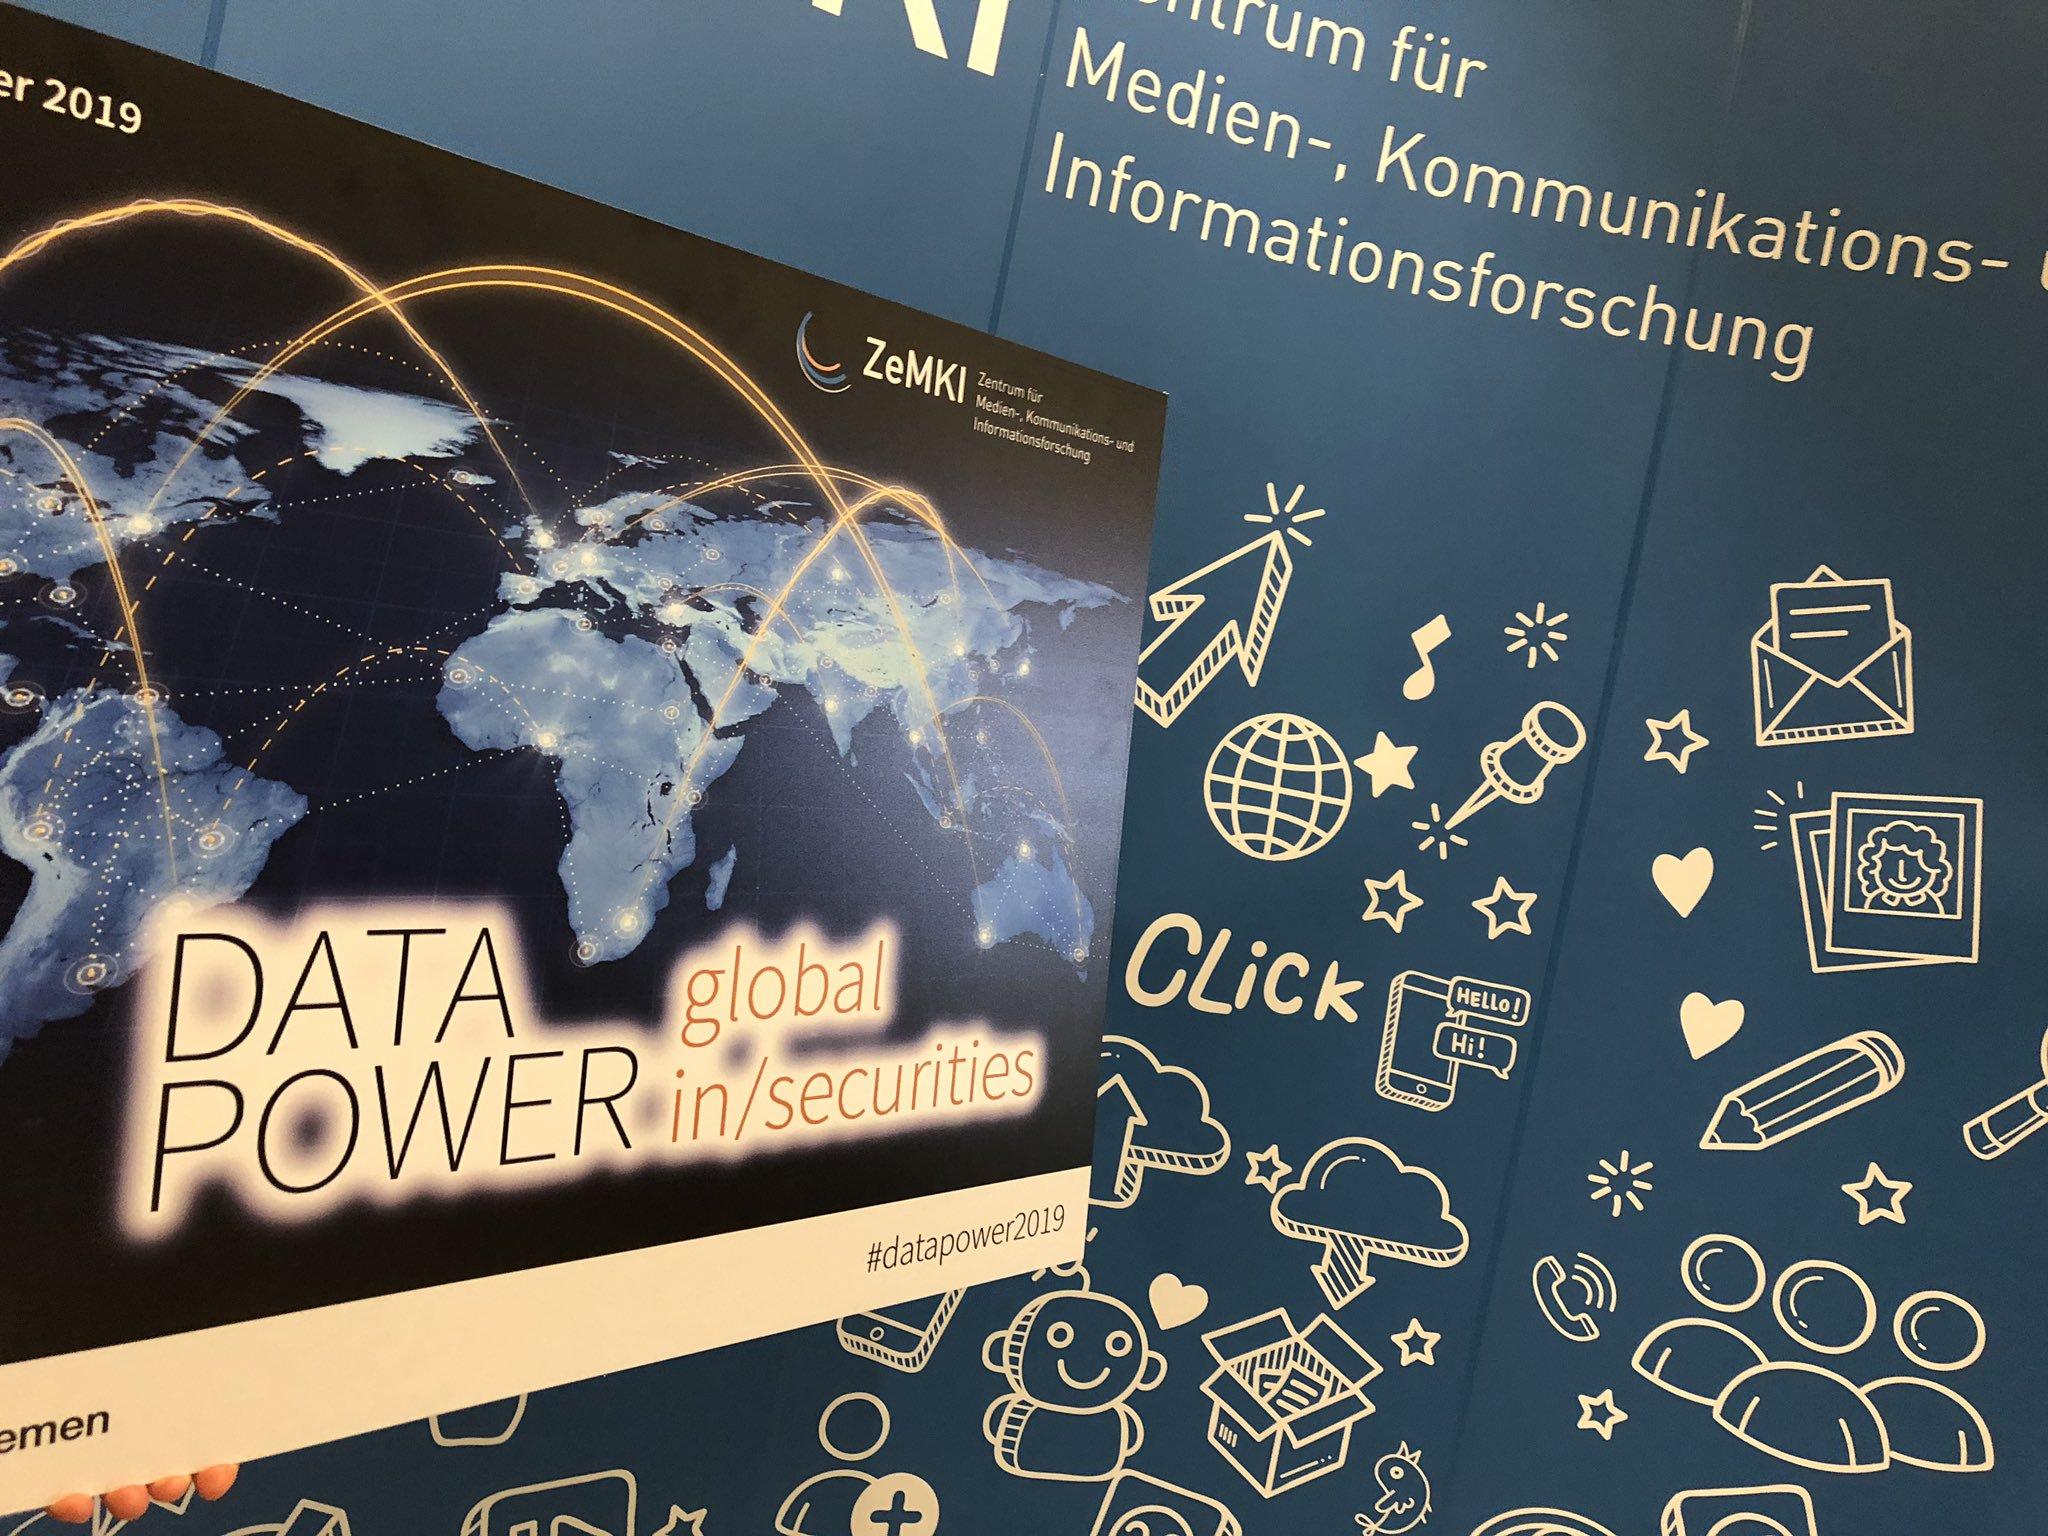 DATA_POWER